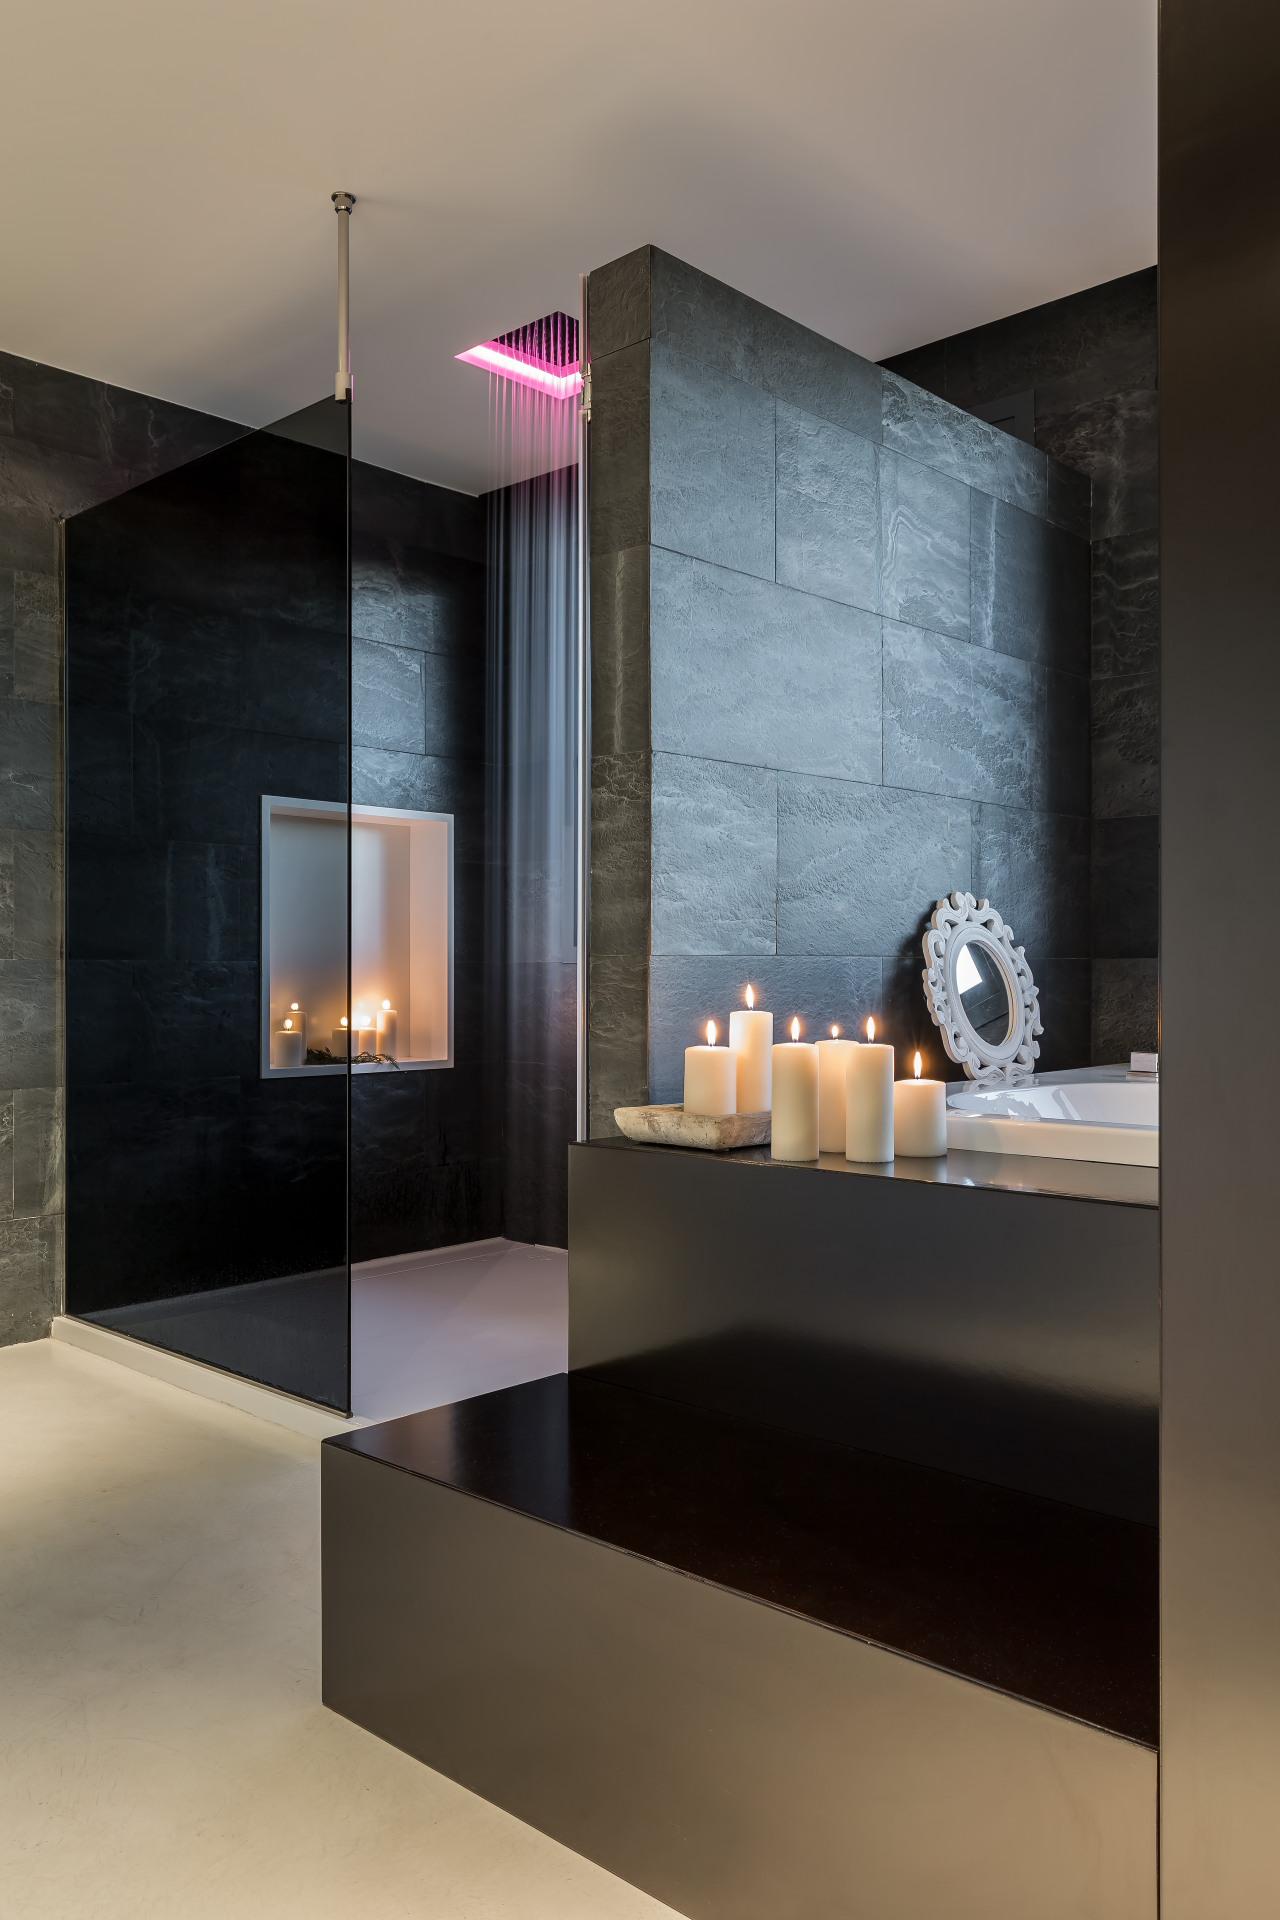 fotografia-arquitectura-valencia-german-cabo-laura_yerpes_canyada (25)